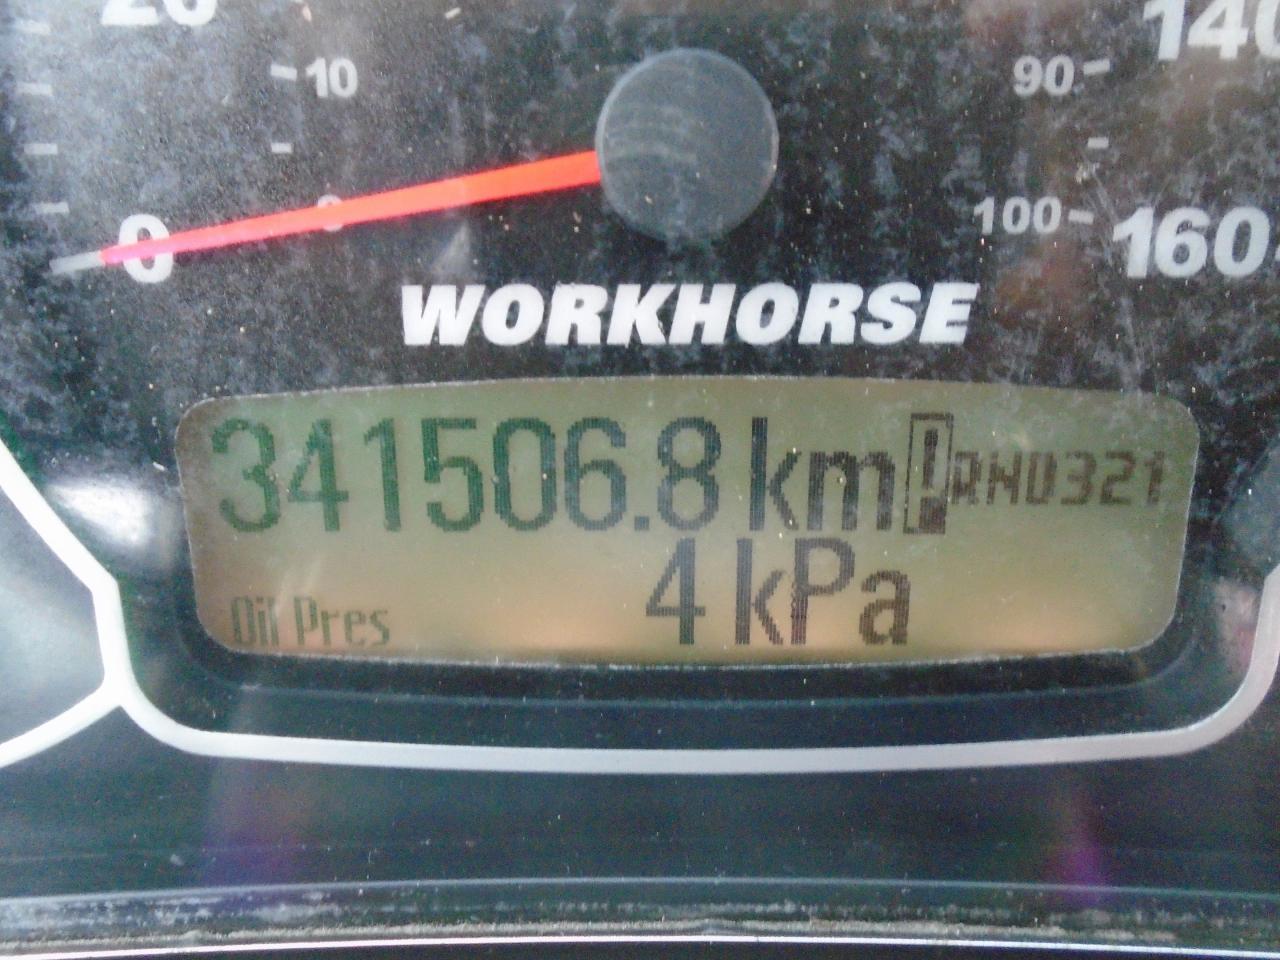 2007 Workhorse food truck